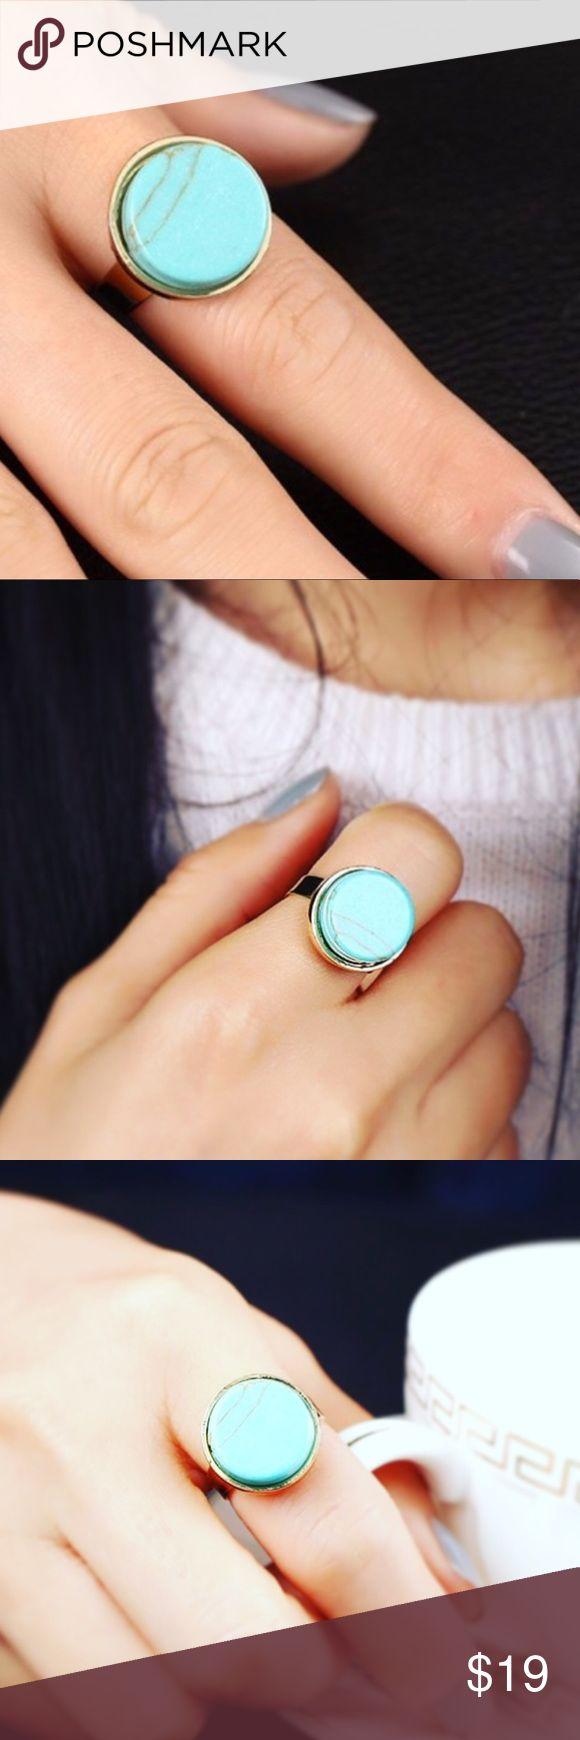 Spotted while shopping on Poshmark: Turquoise Festival Ring! #poshmark #fashion #shopping #style #Jewelry